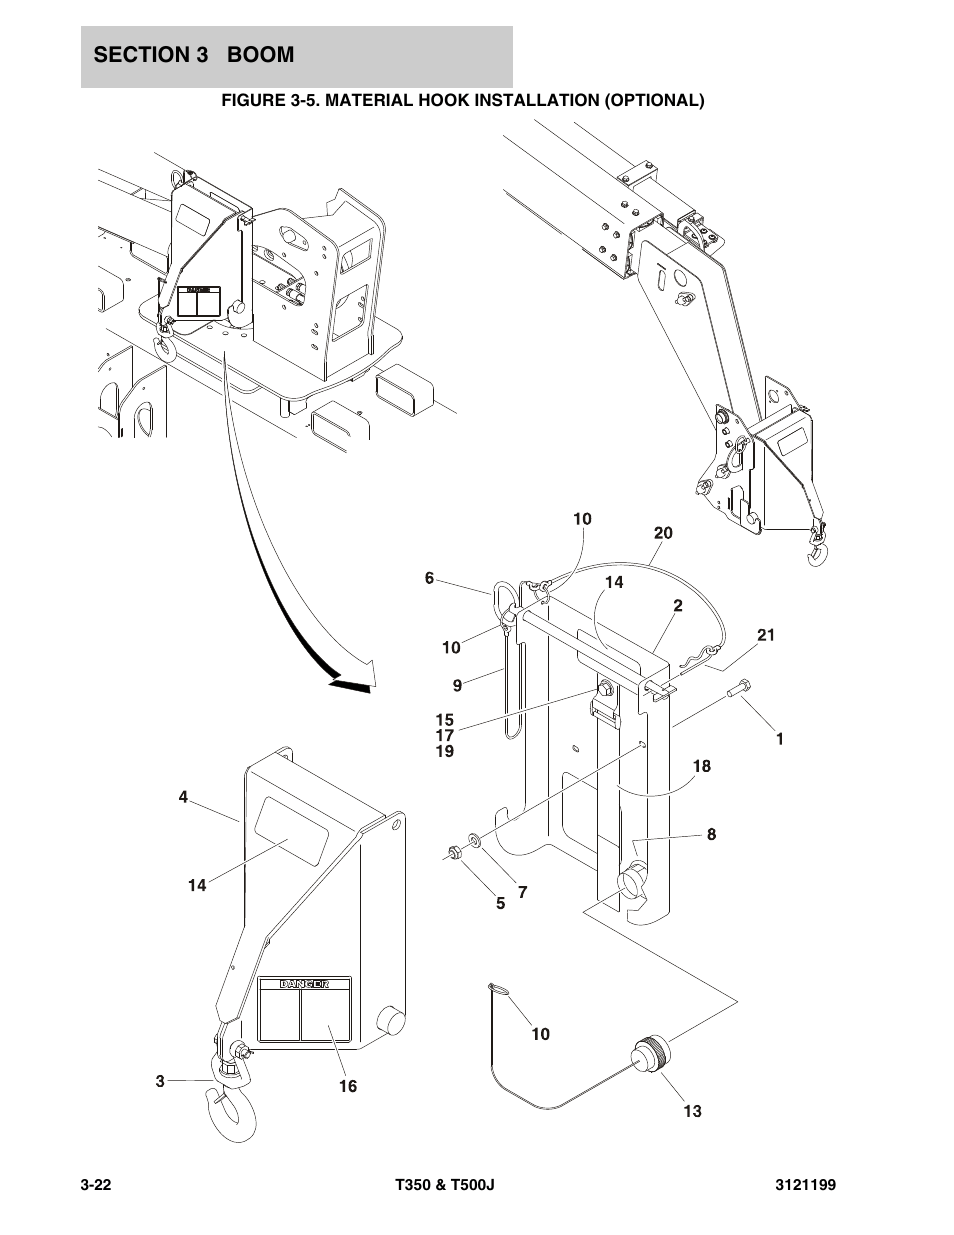 Jlg t350 parts diagram wiring diagrams